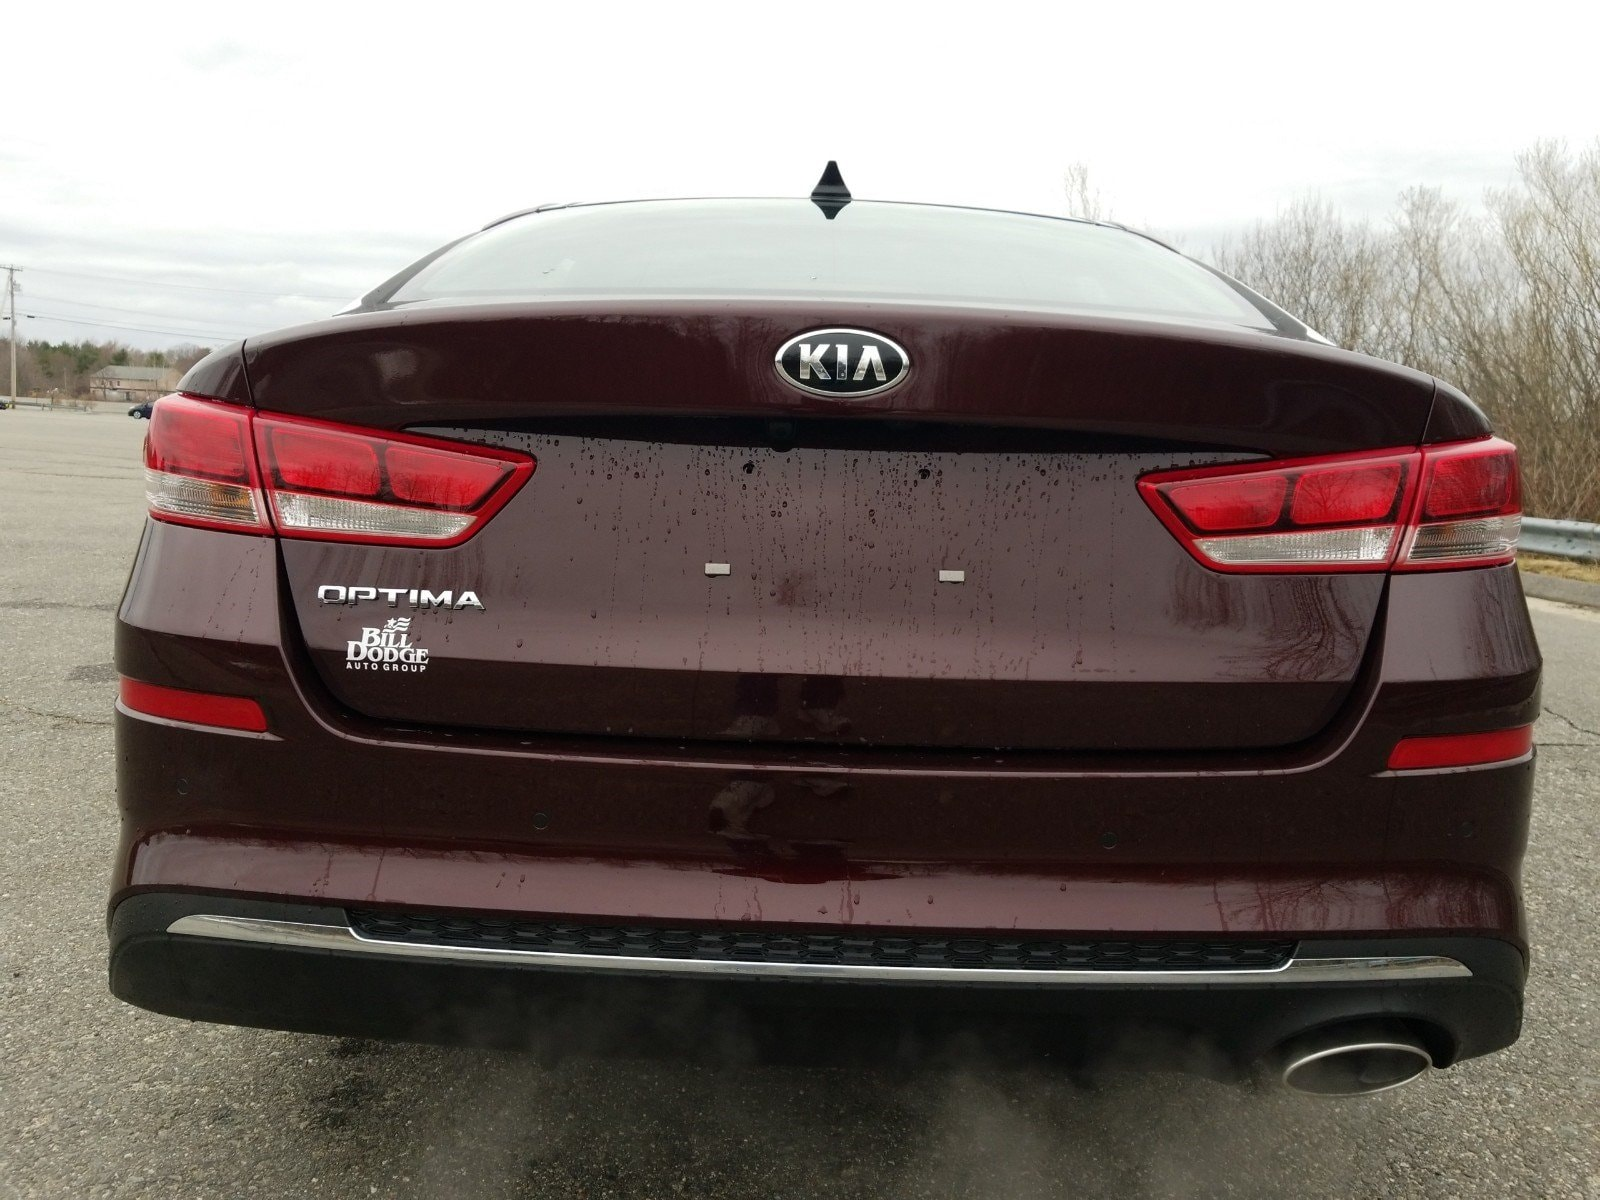 New 2019 Kia Optima For Sale at Bill Dodge Kia | VIN: 5XXGT4L39KG295023